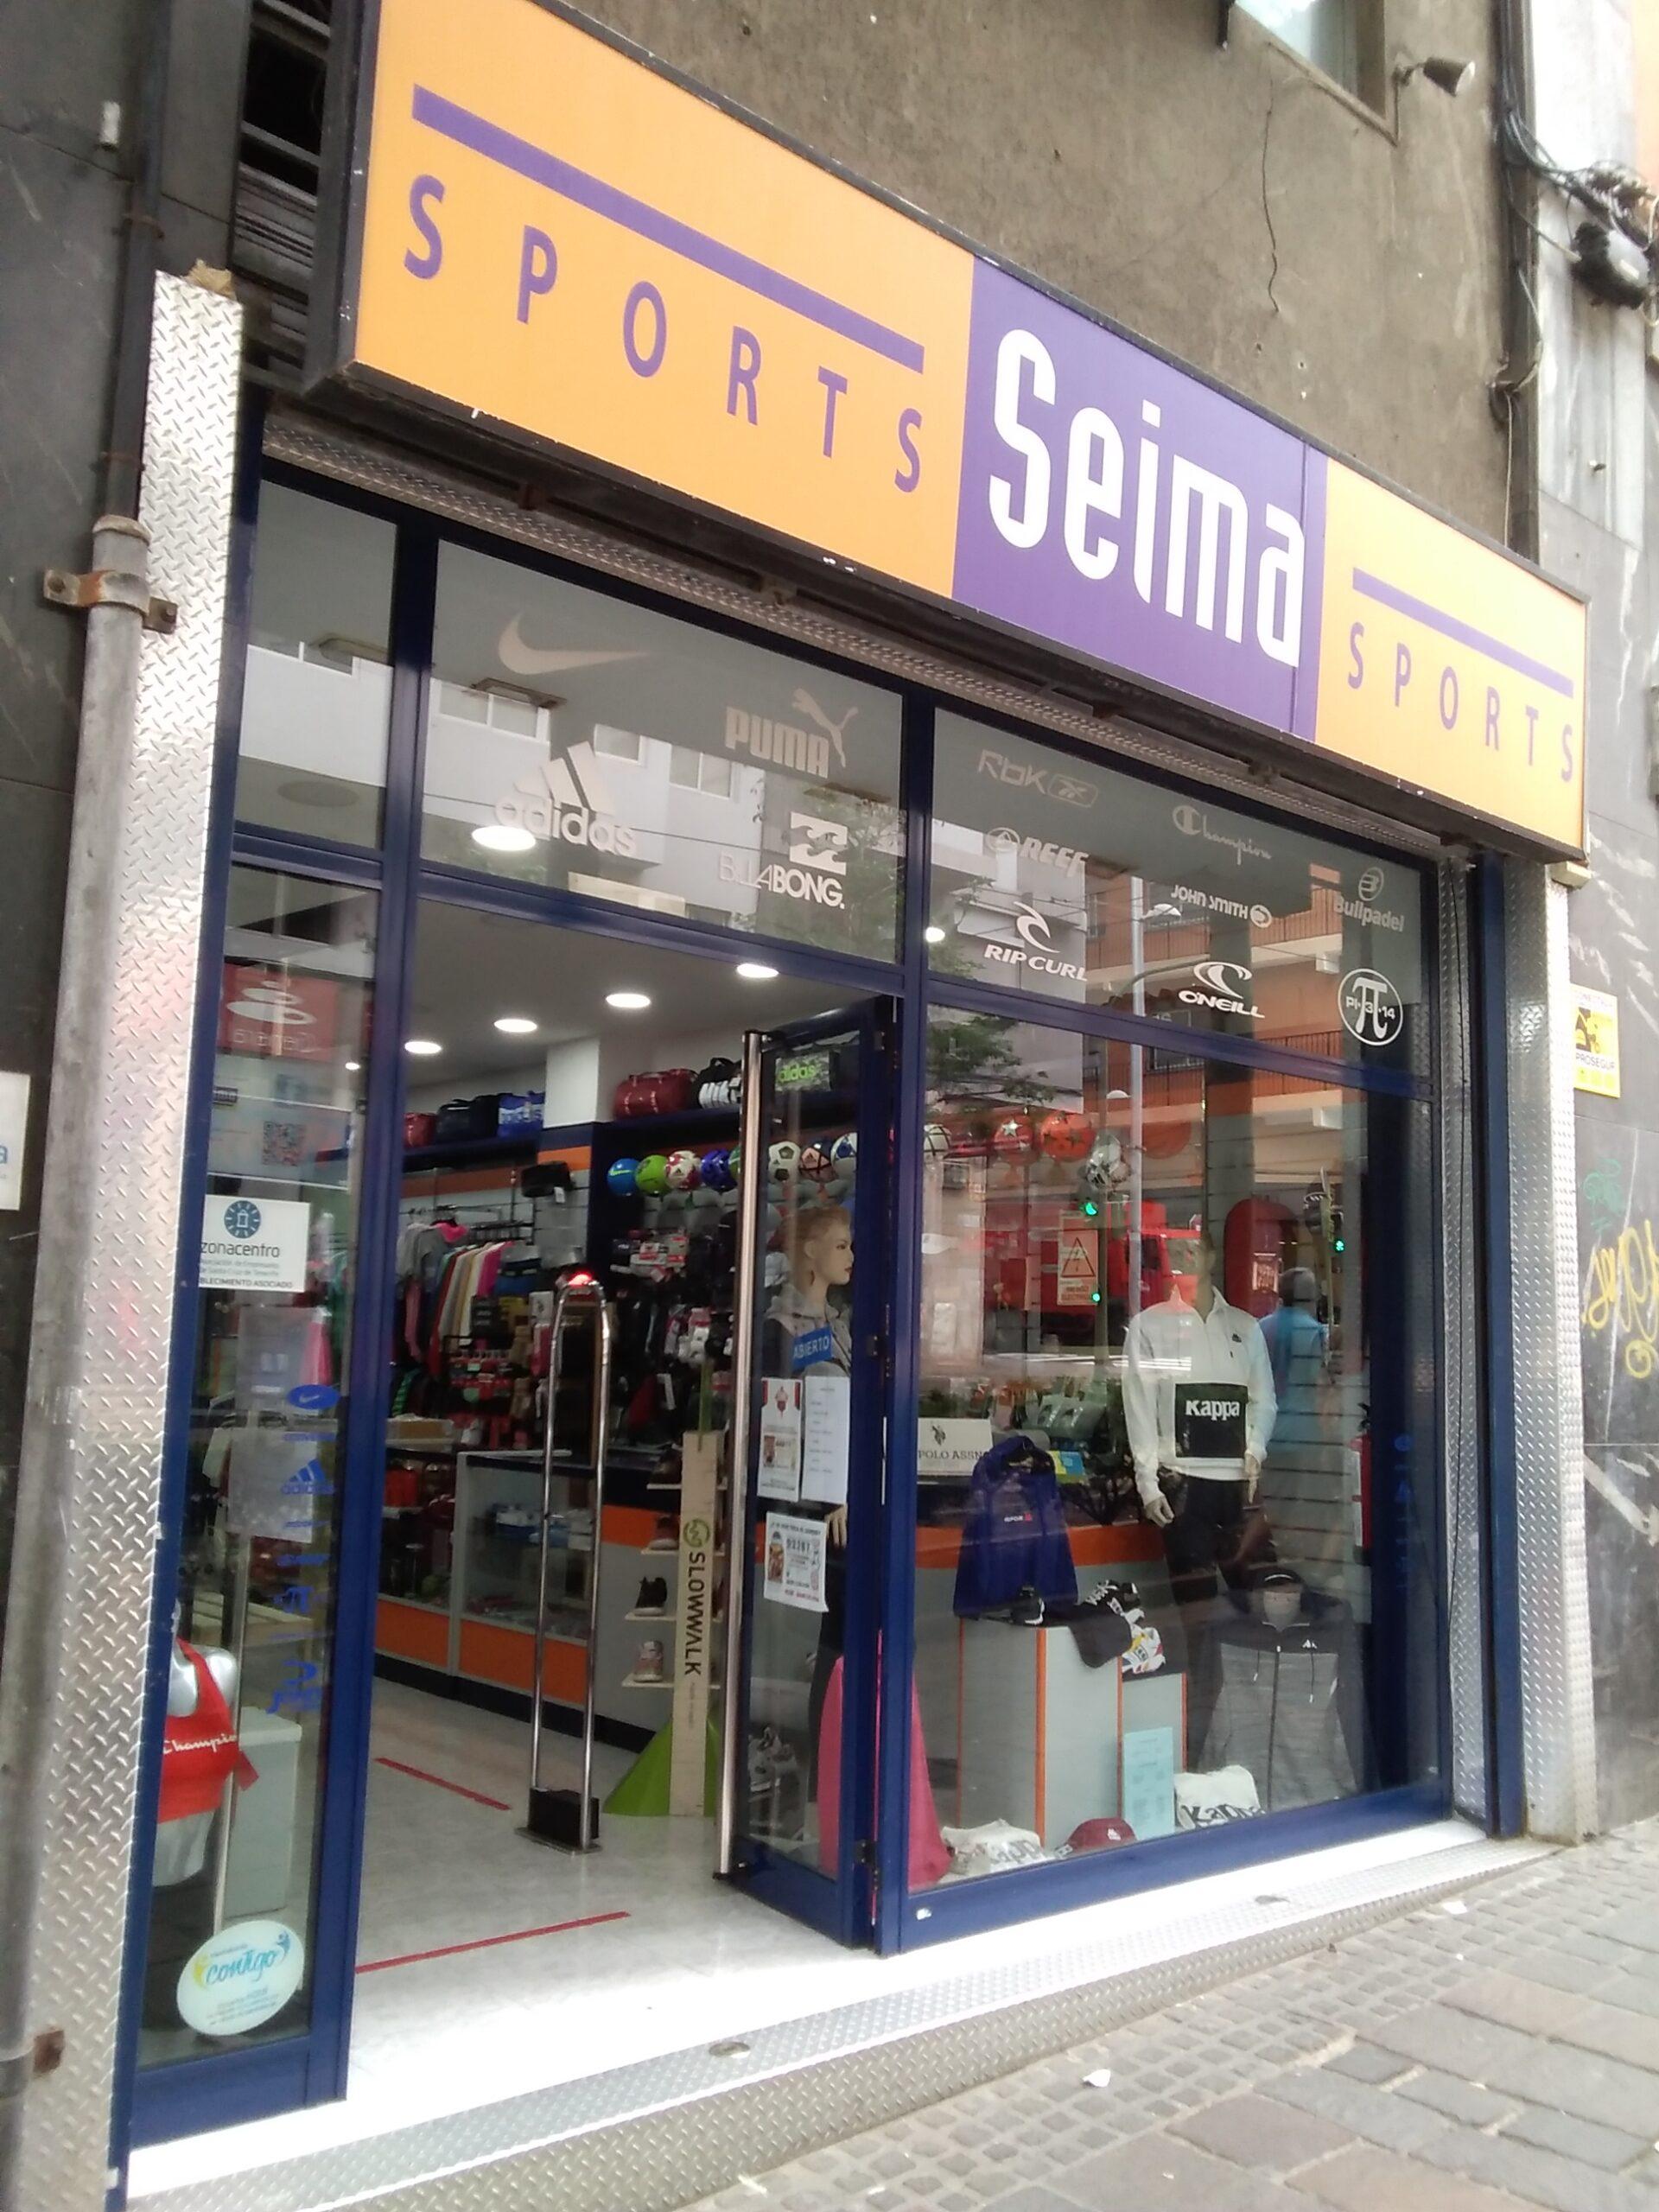 Seima sports